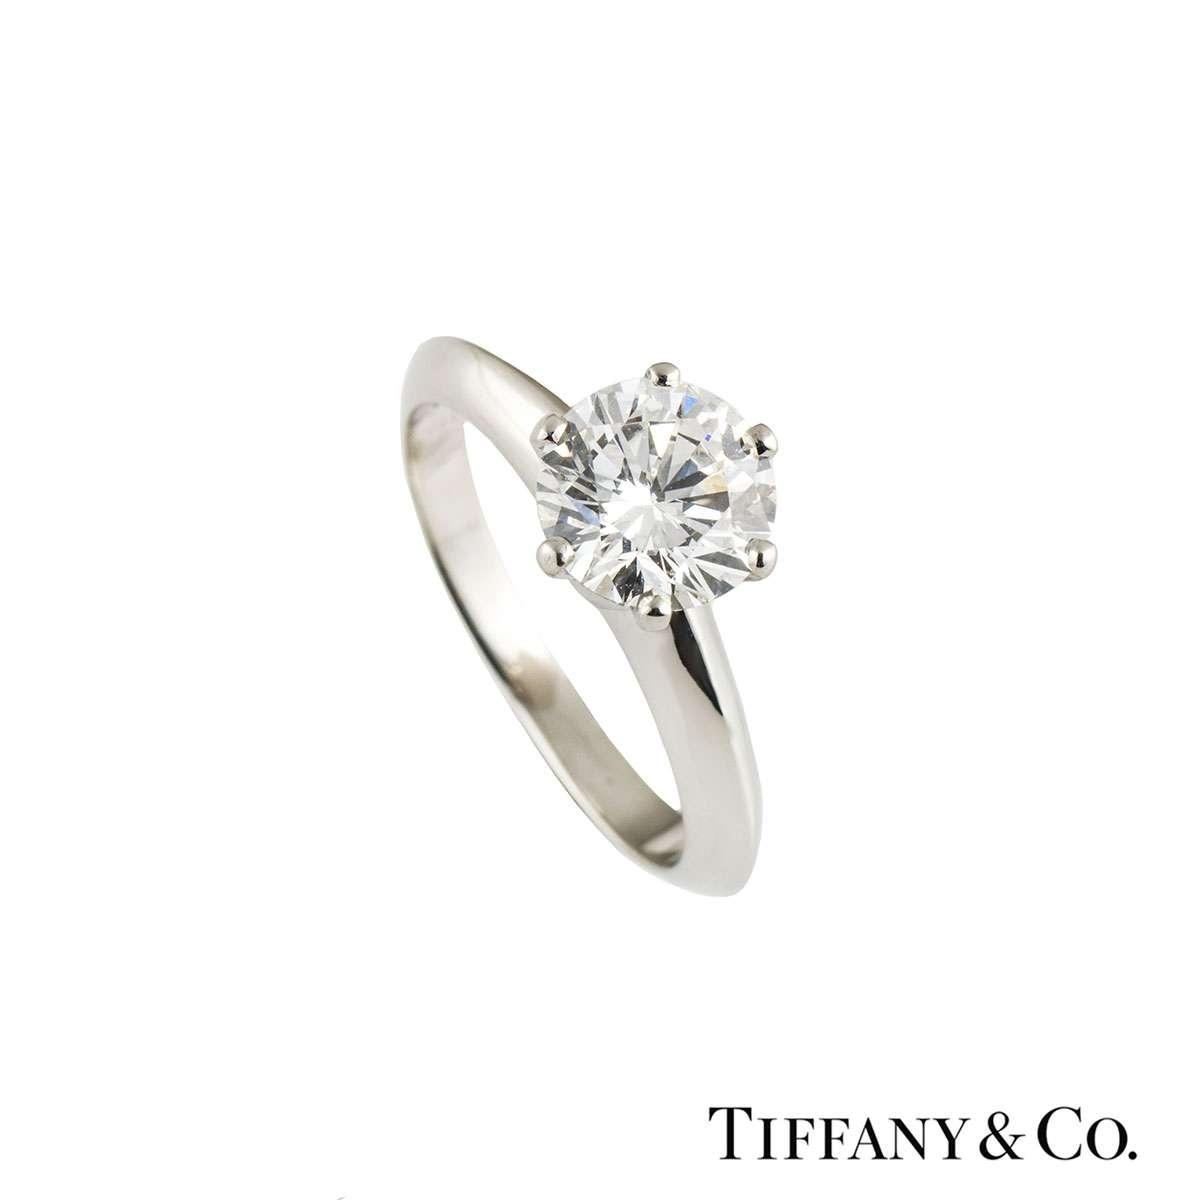 Tiffany & Co. Tiffany Setting Band Ring 1.05ct G/VVS1